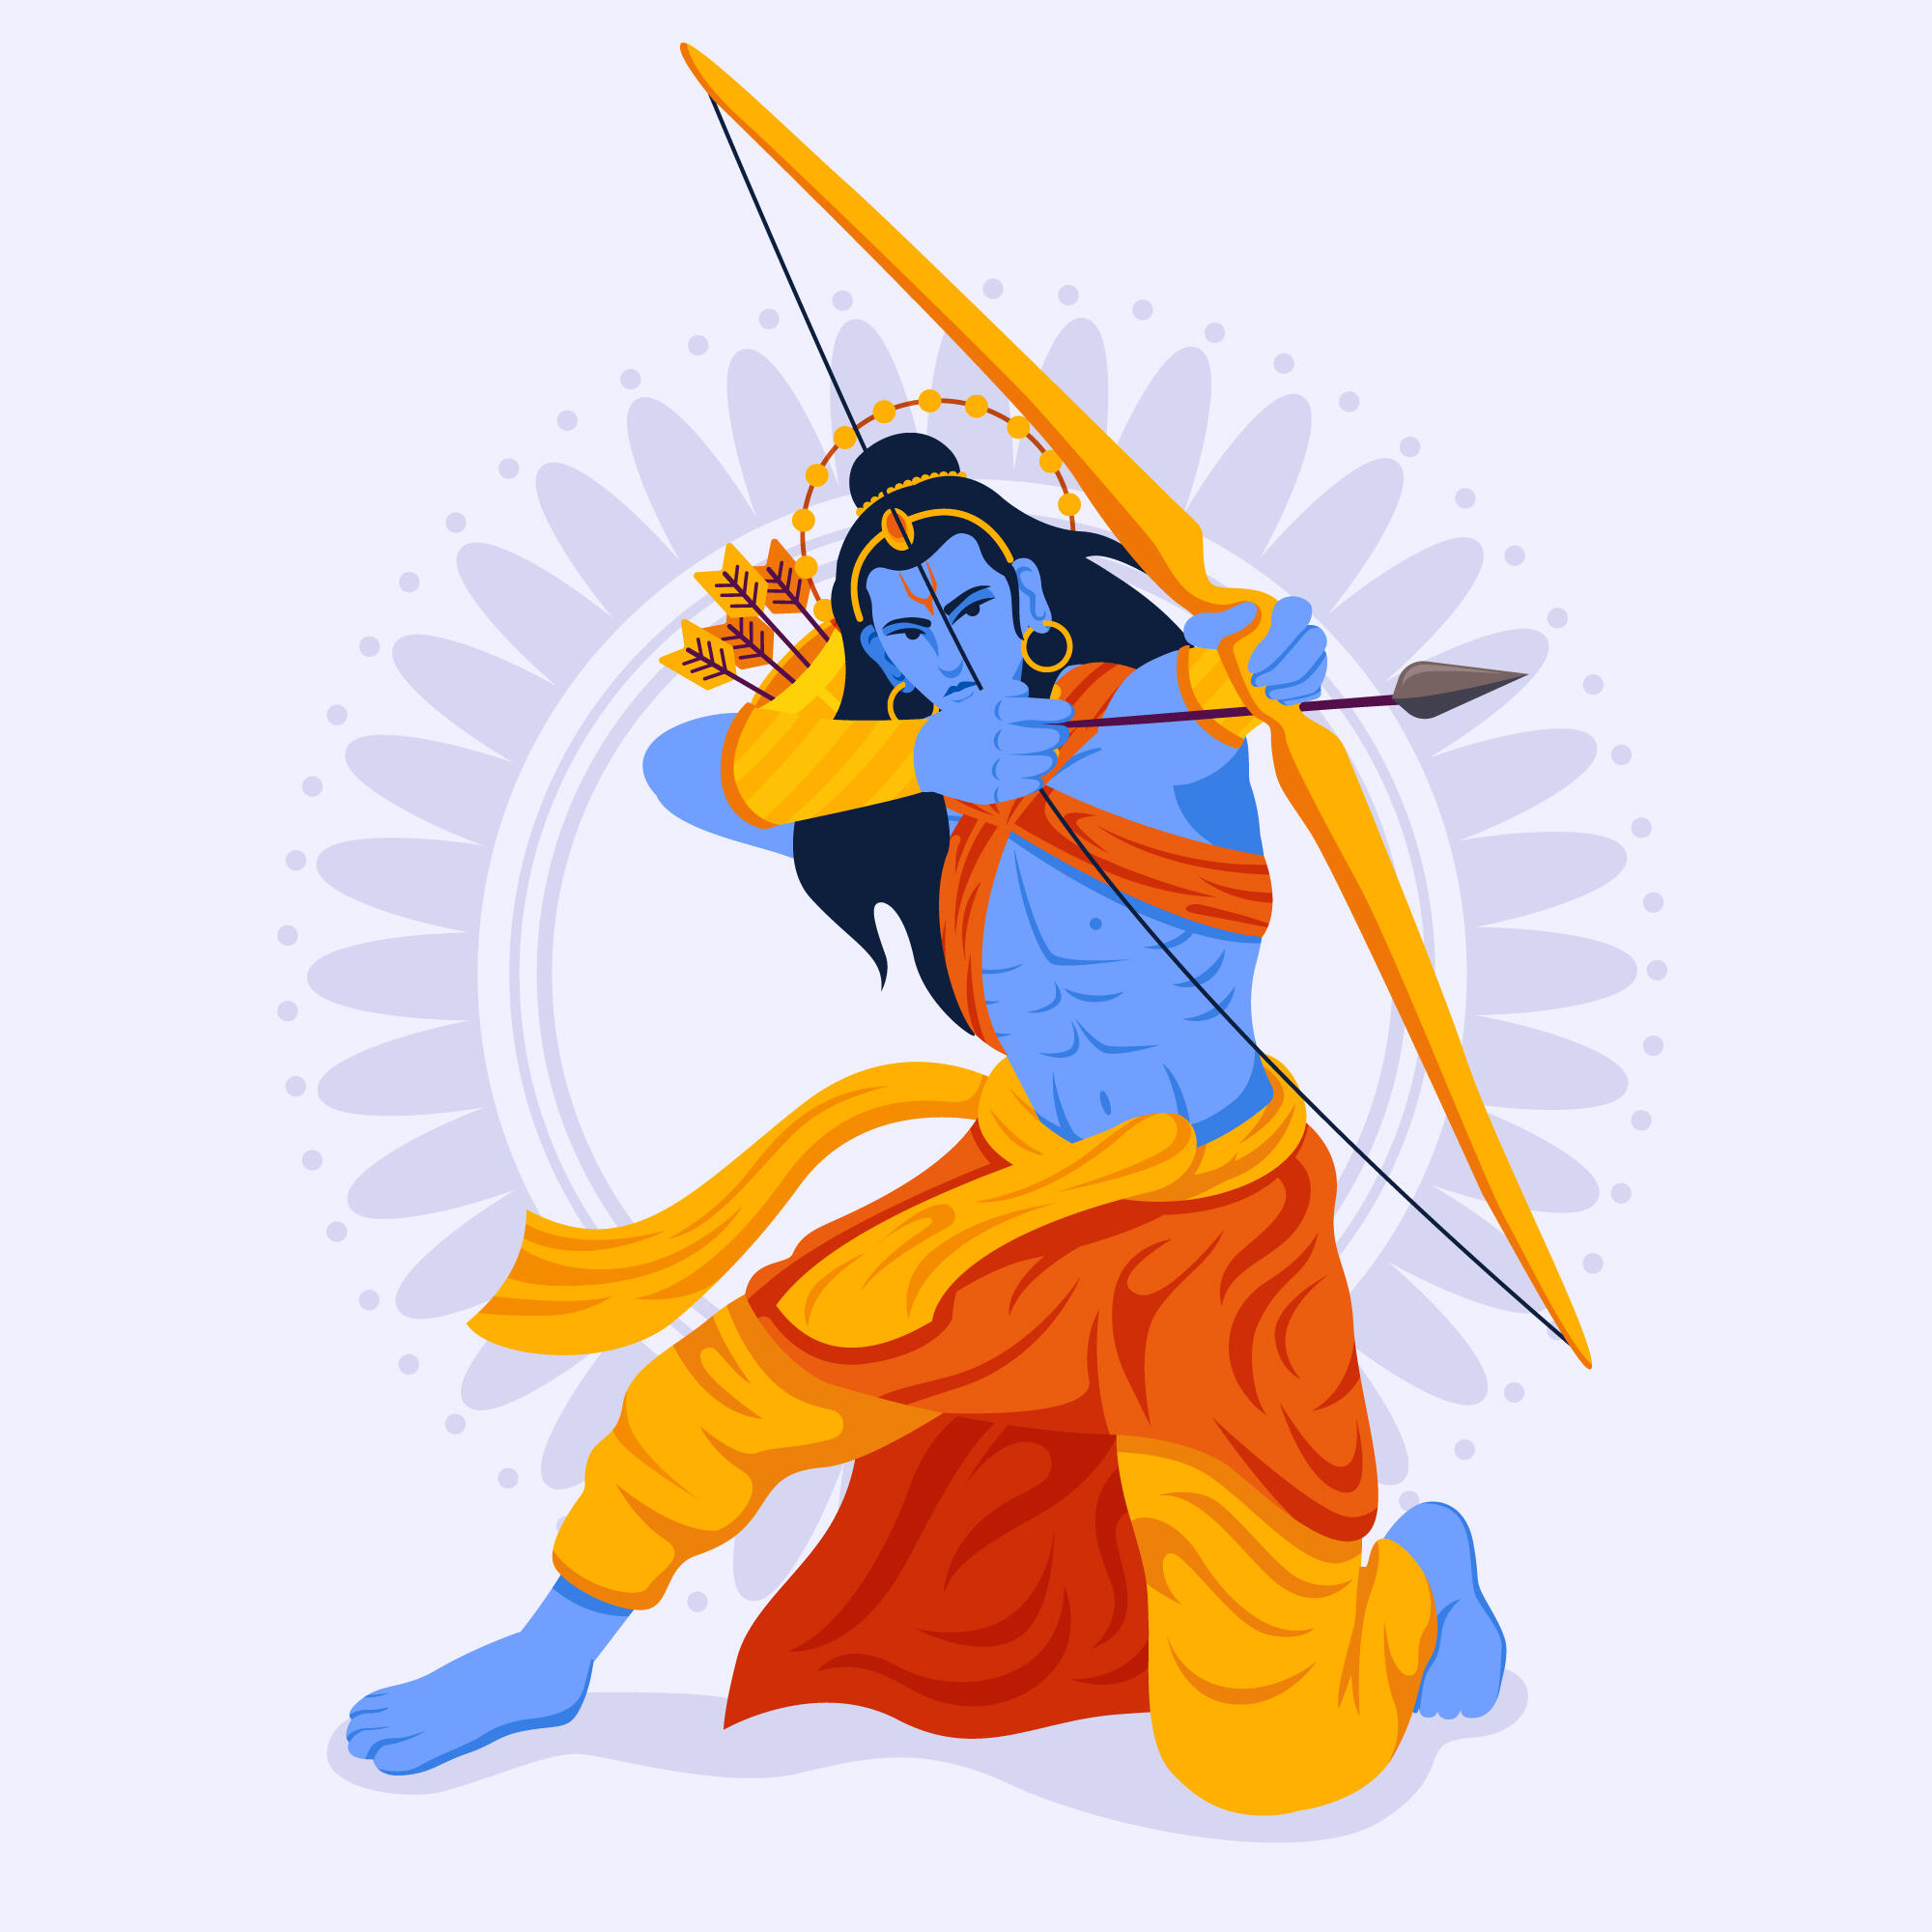 Shri Ram Images HD Free Download